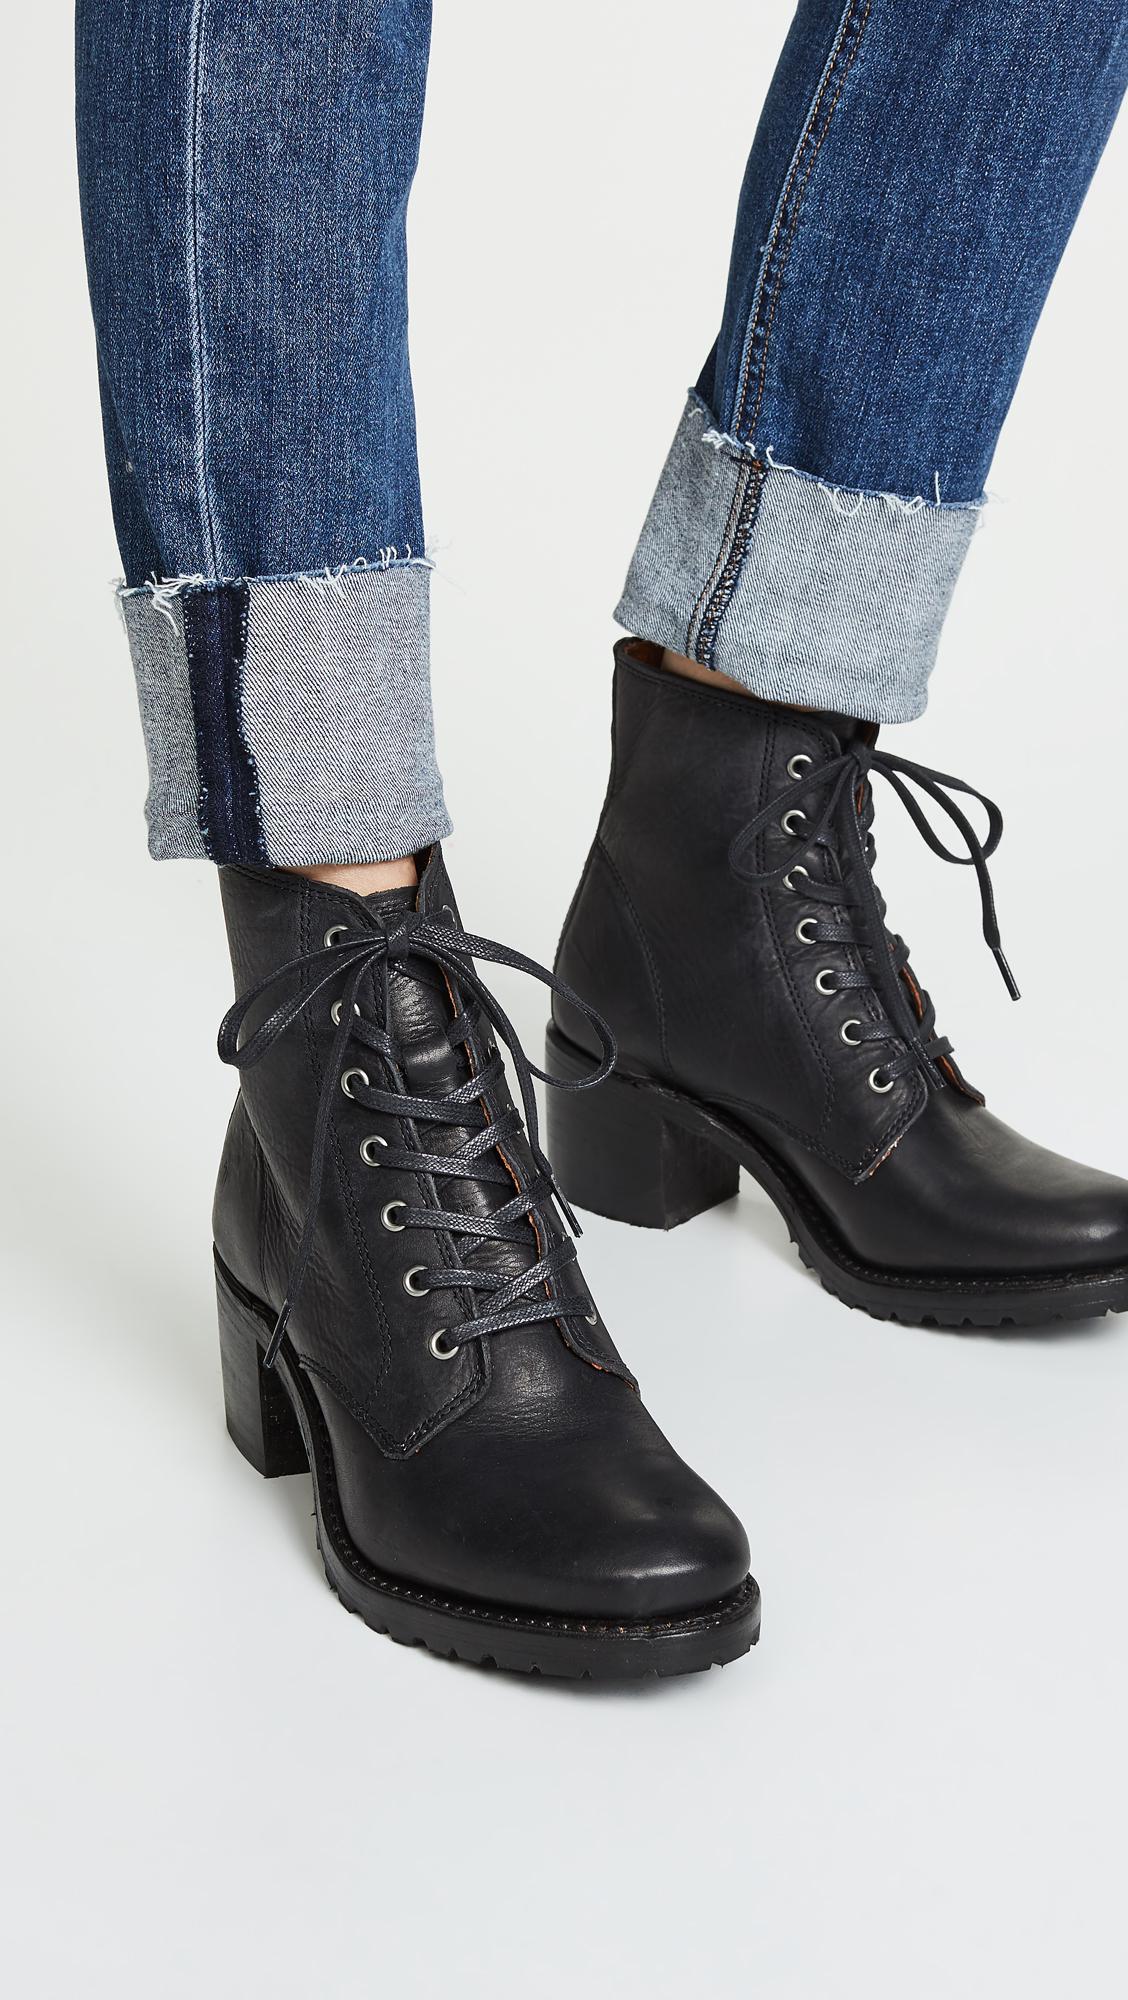 ae4d4512380f Frye - Black Sabrina 6g Lace Up Boots - Lyst. View fullscreen